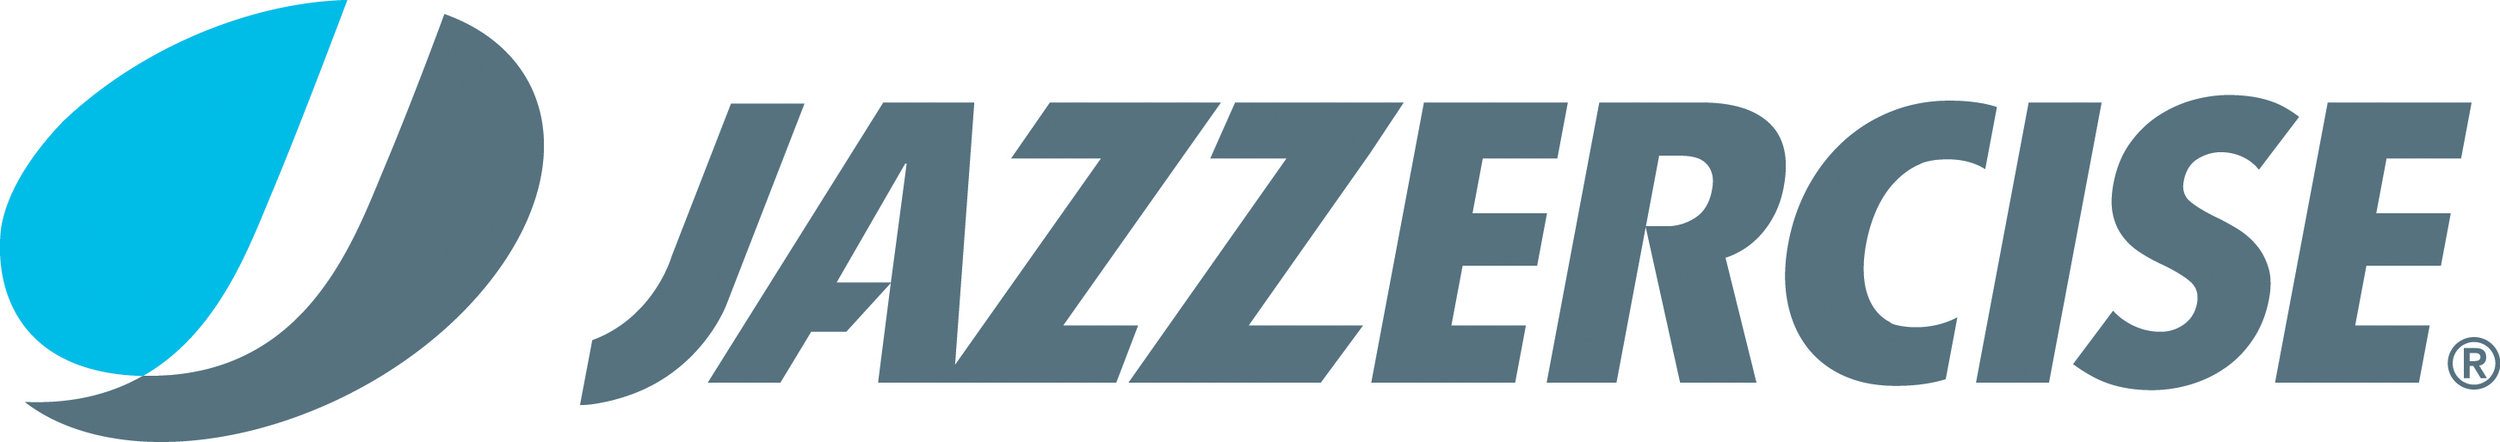 logo_jazzercise_primary_blue2.jpg